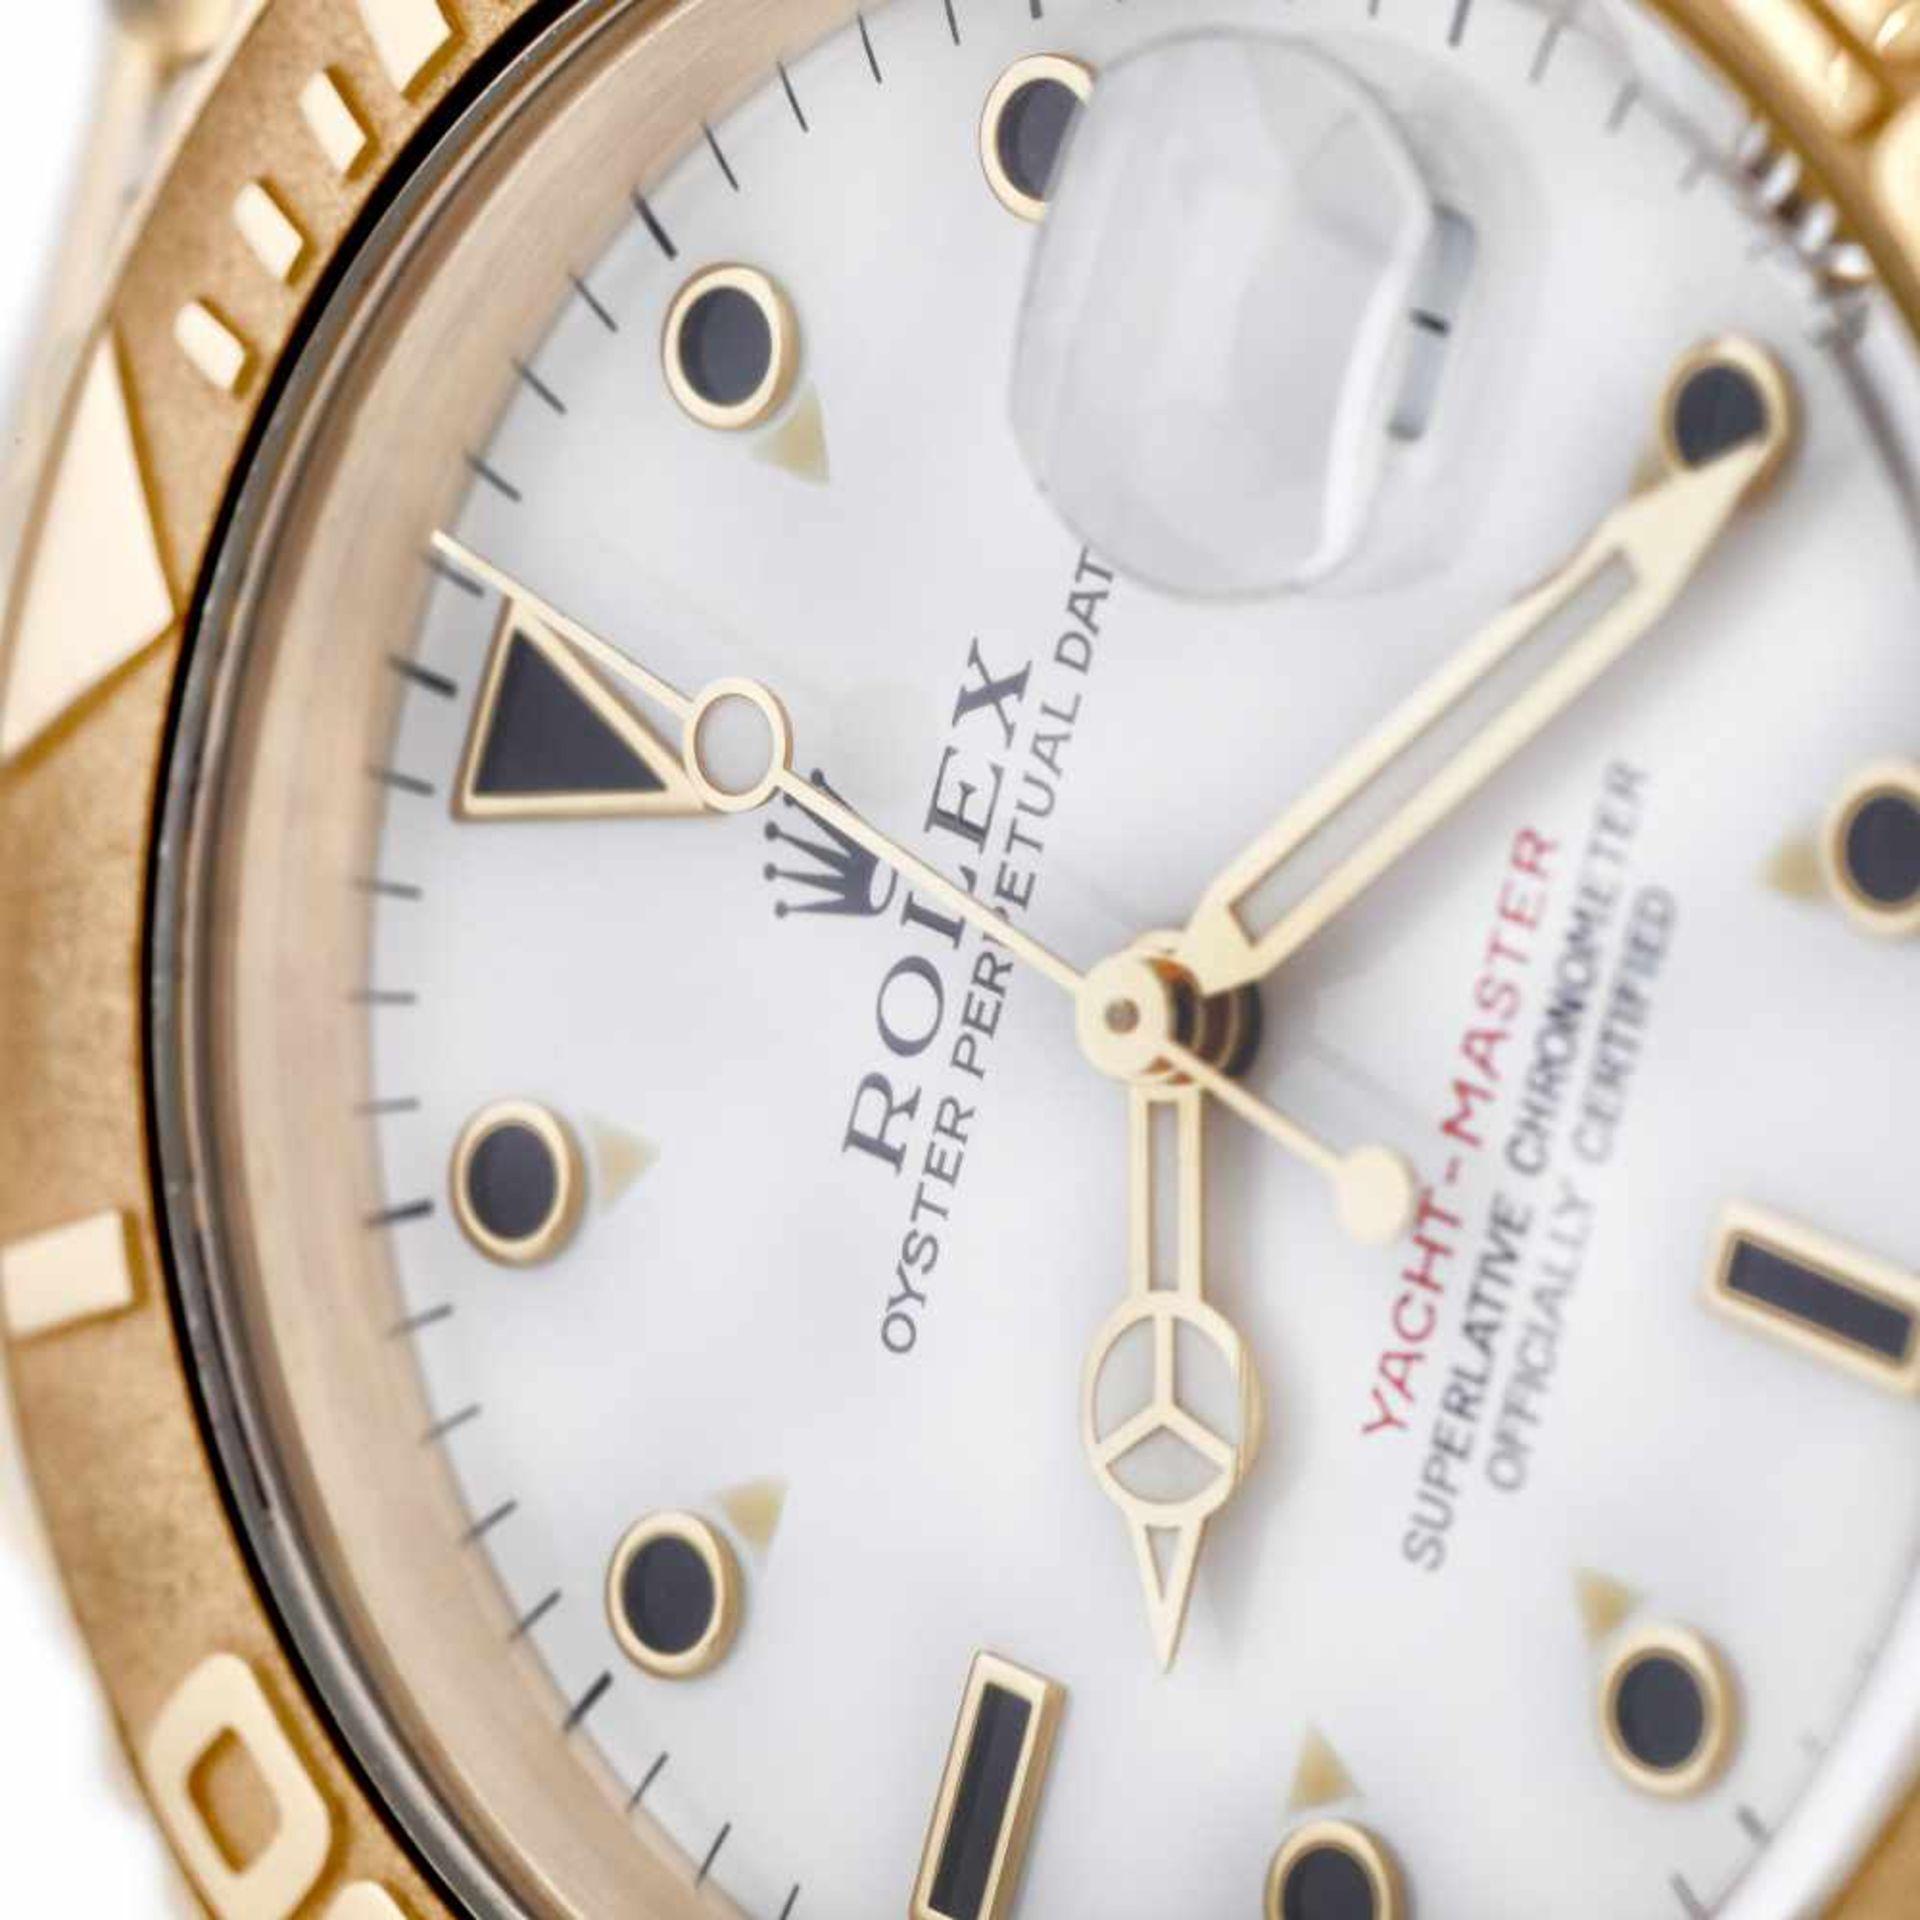 Rolex Yacht Master wristwatch, gold, men, instruction manual and original box - Bild 4 aus 6